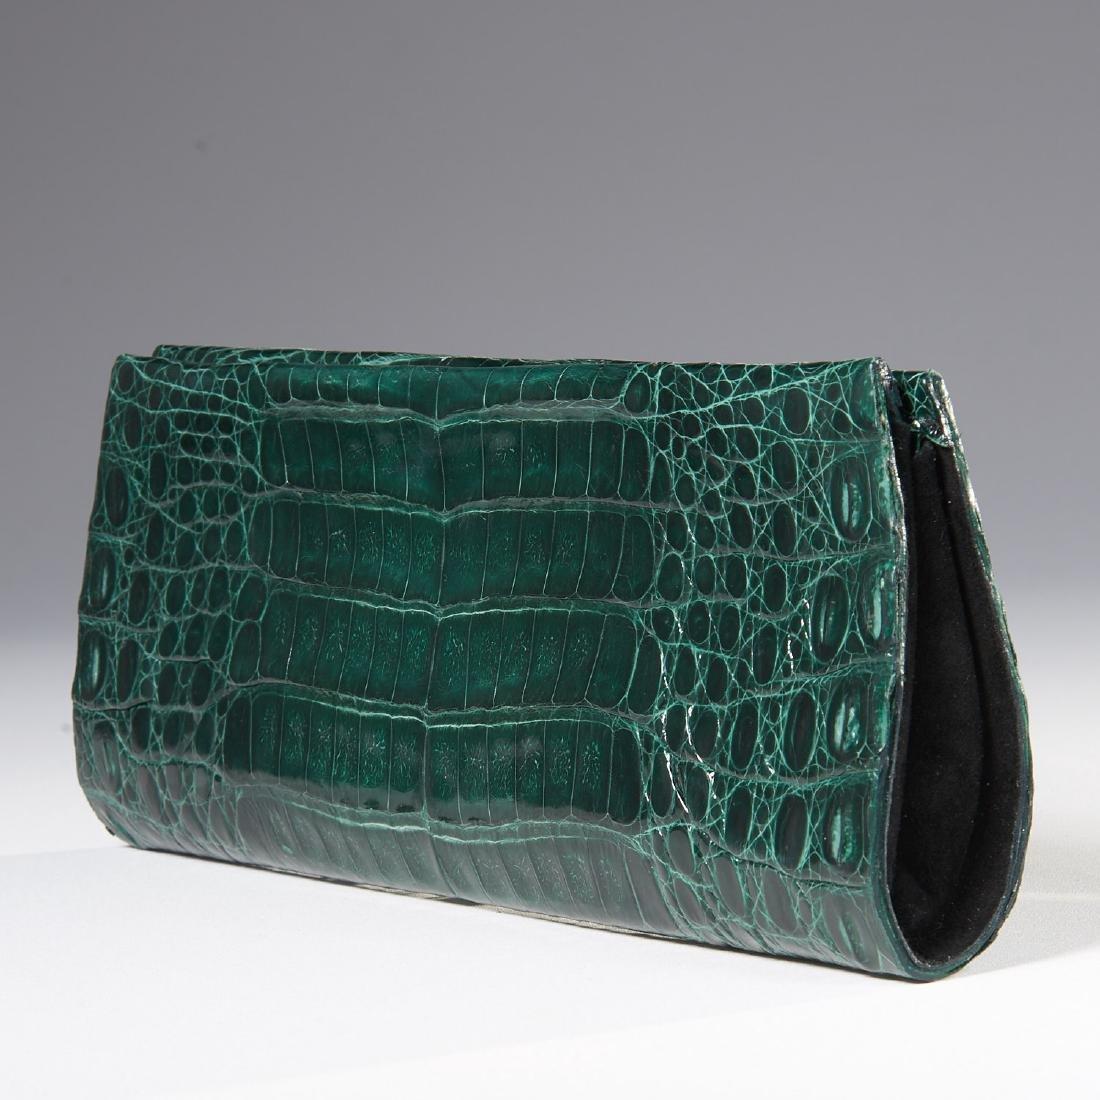 Gambelle green glazed crocodile clutch handbag - 2